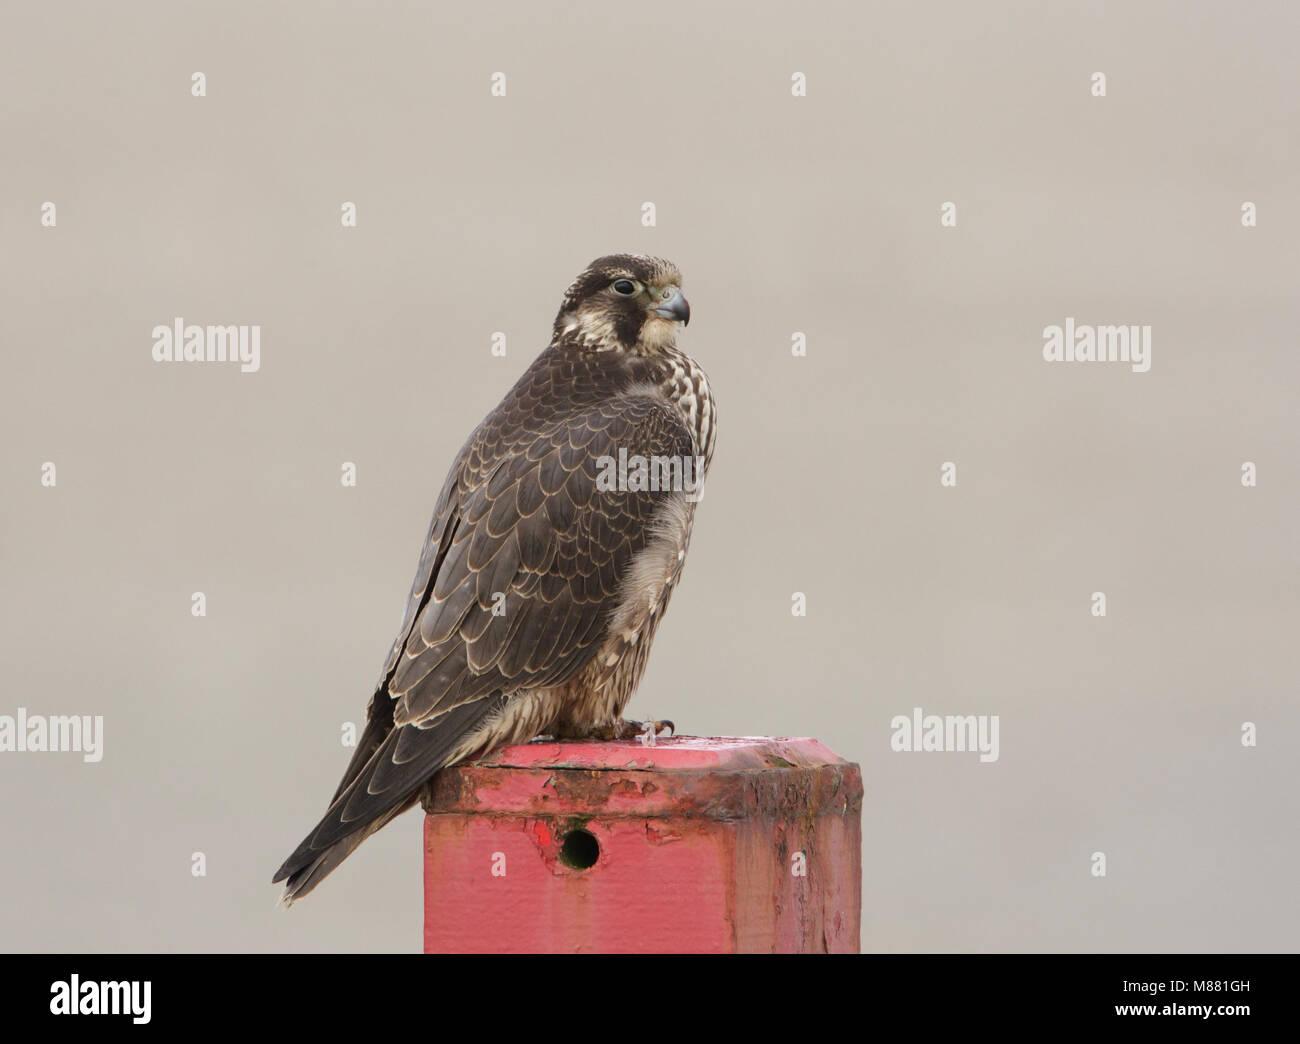 Onvolwassen Slechtvalk ziitend op een paal op het strand van Terschelling; Immature Peregrine Falcon (Falco peregrinus) perched on a pole on a Dutch b Stock Photo